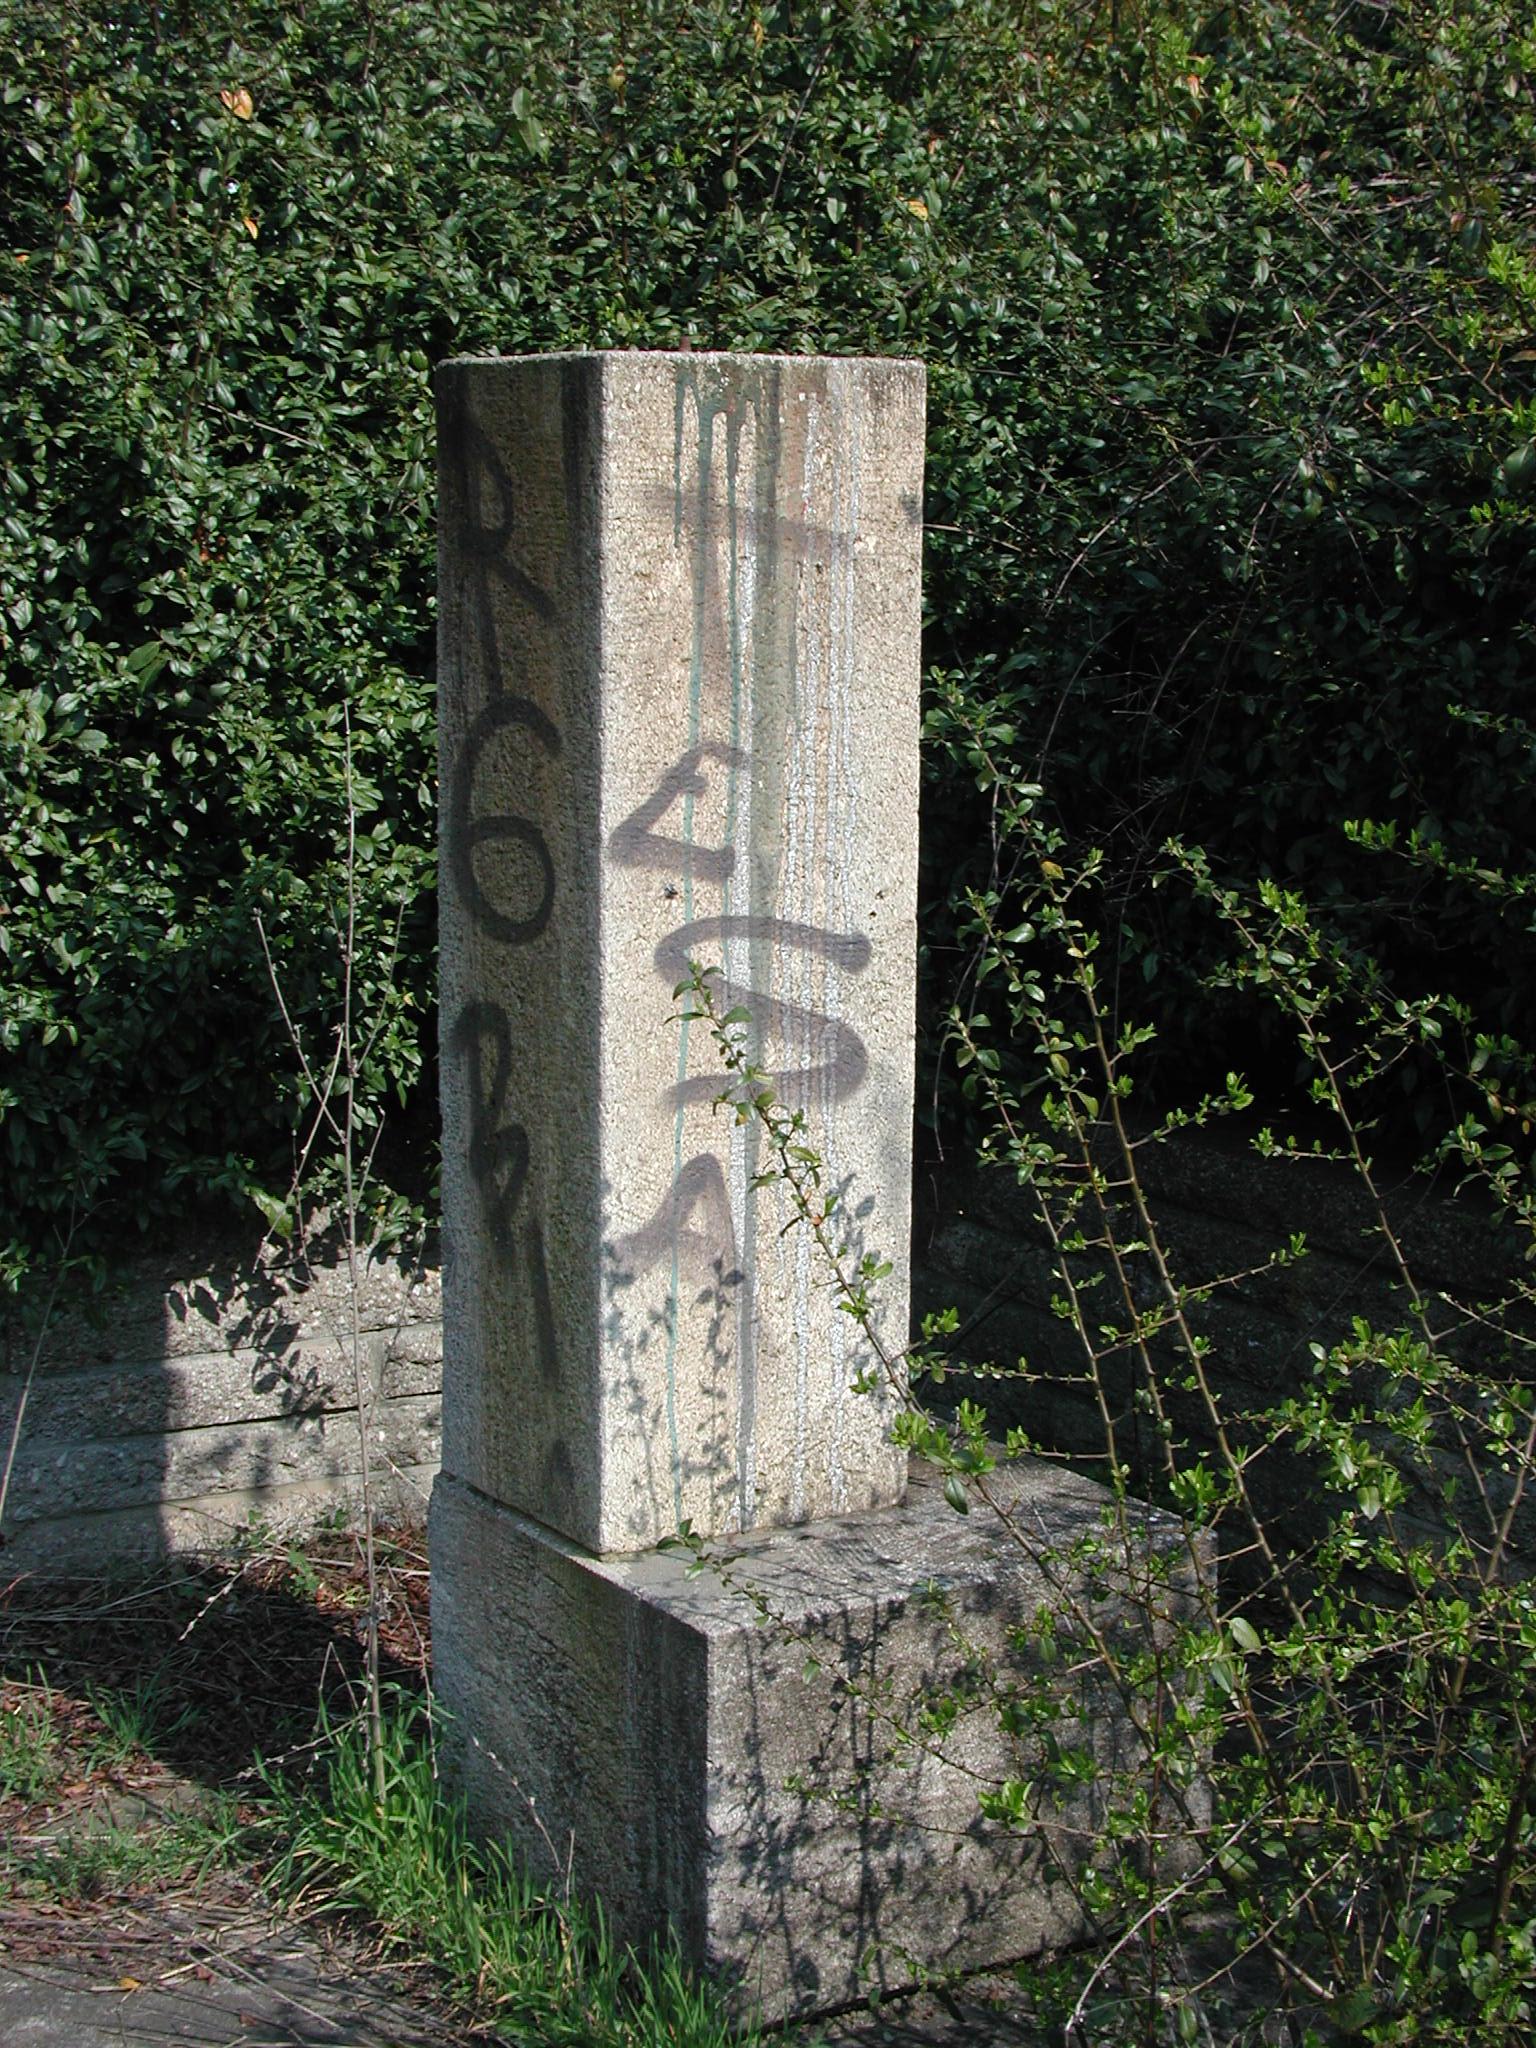 Denkmalsockel, Josef Orlopp (Urheber: 44pinguine)